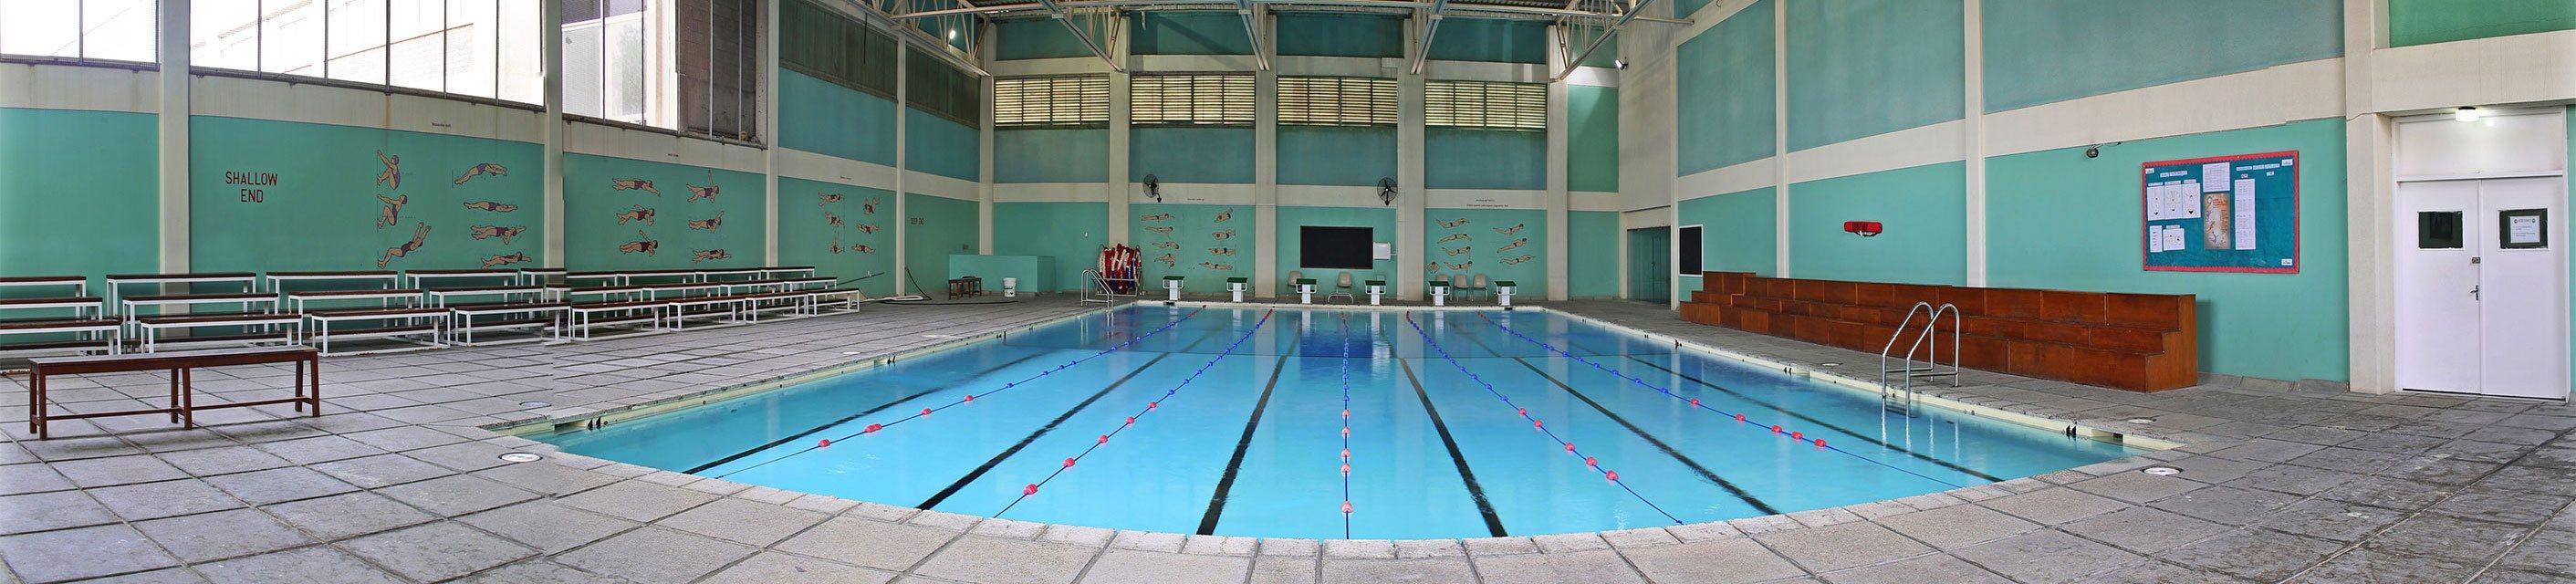 The international school of choueifat abu dhabi for Swimming pool offers in abu dhabi